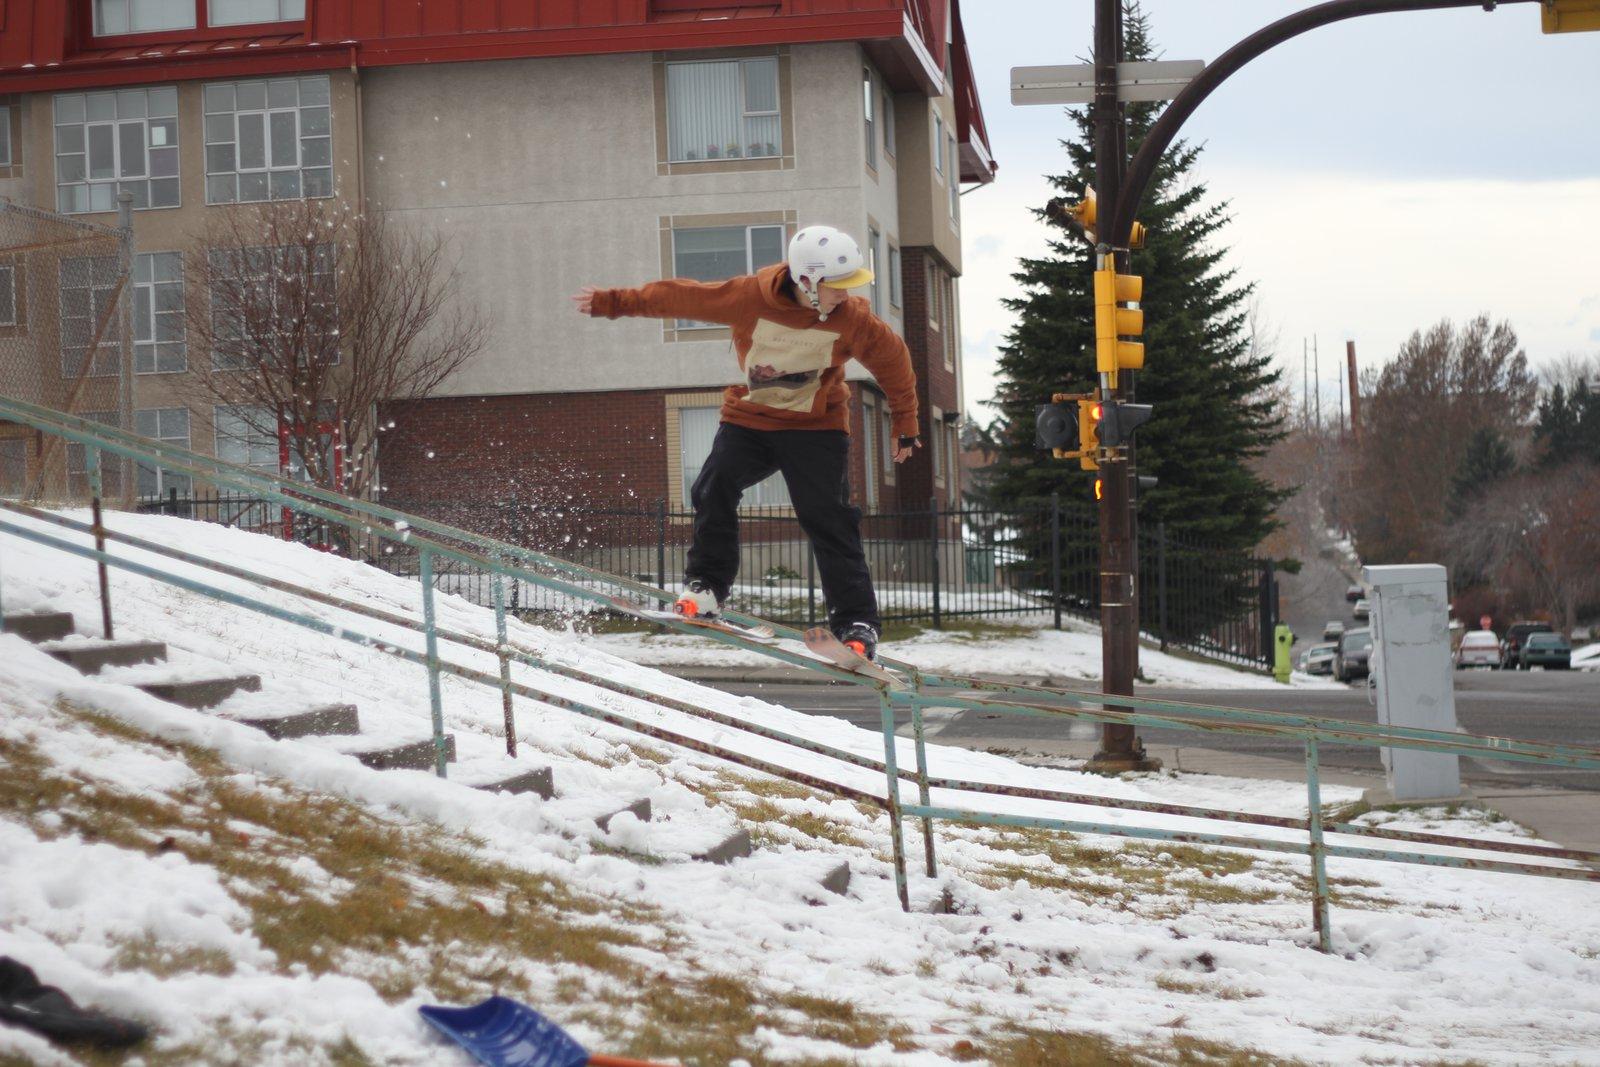 Calgary down flat rail